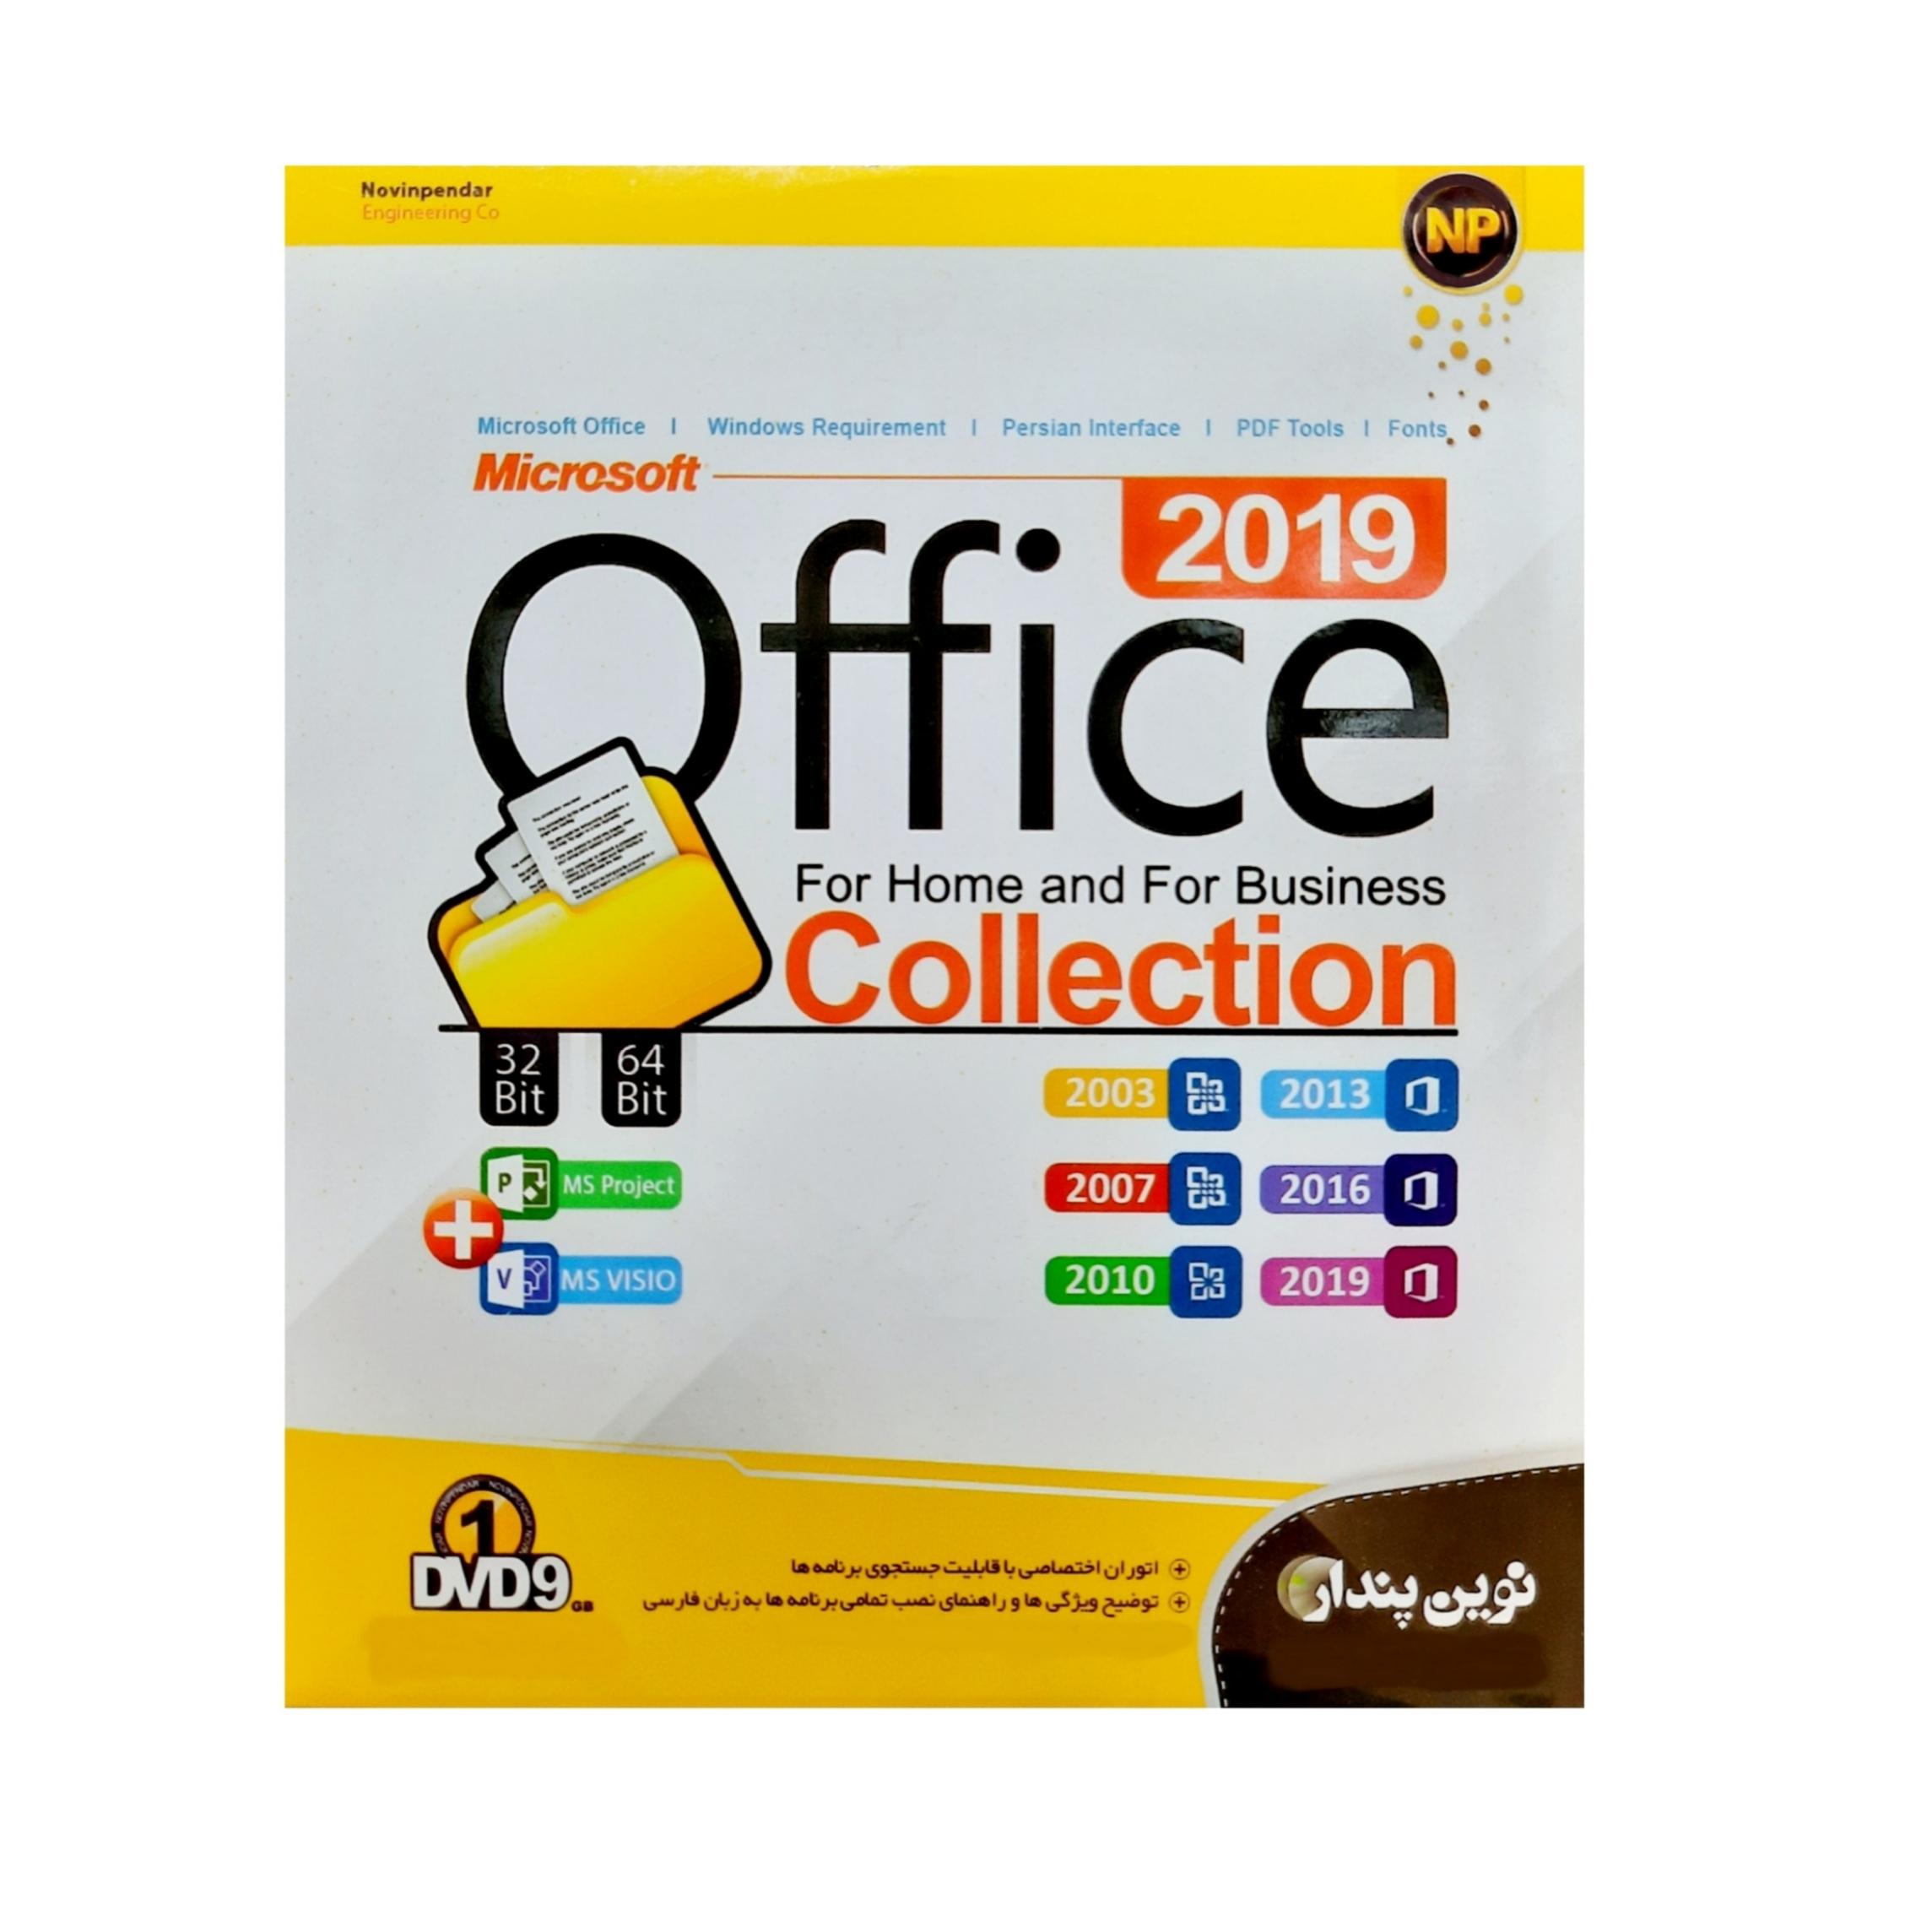 نرم افزار Office 2019 Collection نشر نوین پندار thumb